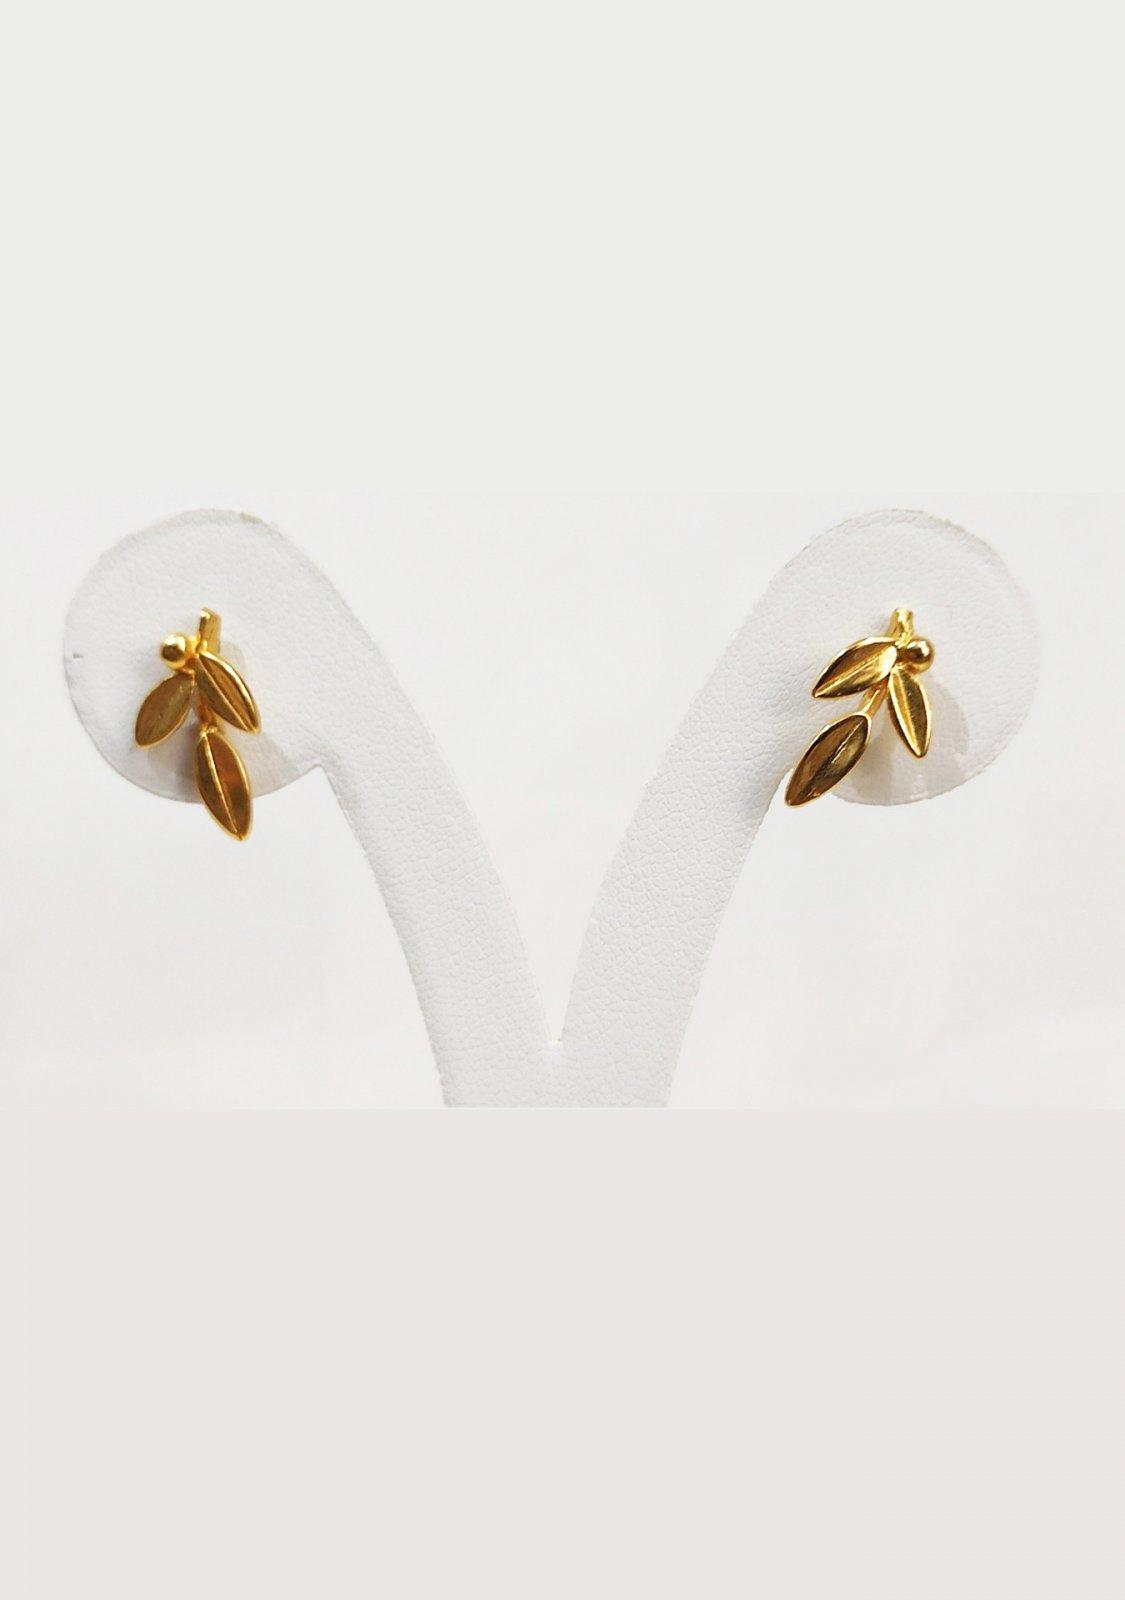 Greek olive branch gold plated silver stud - dangle earrings